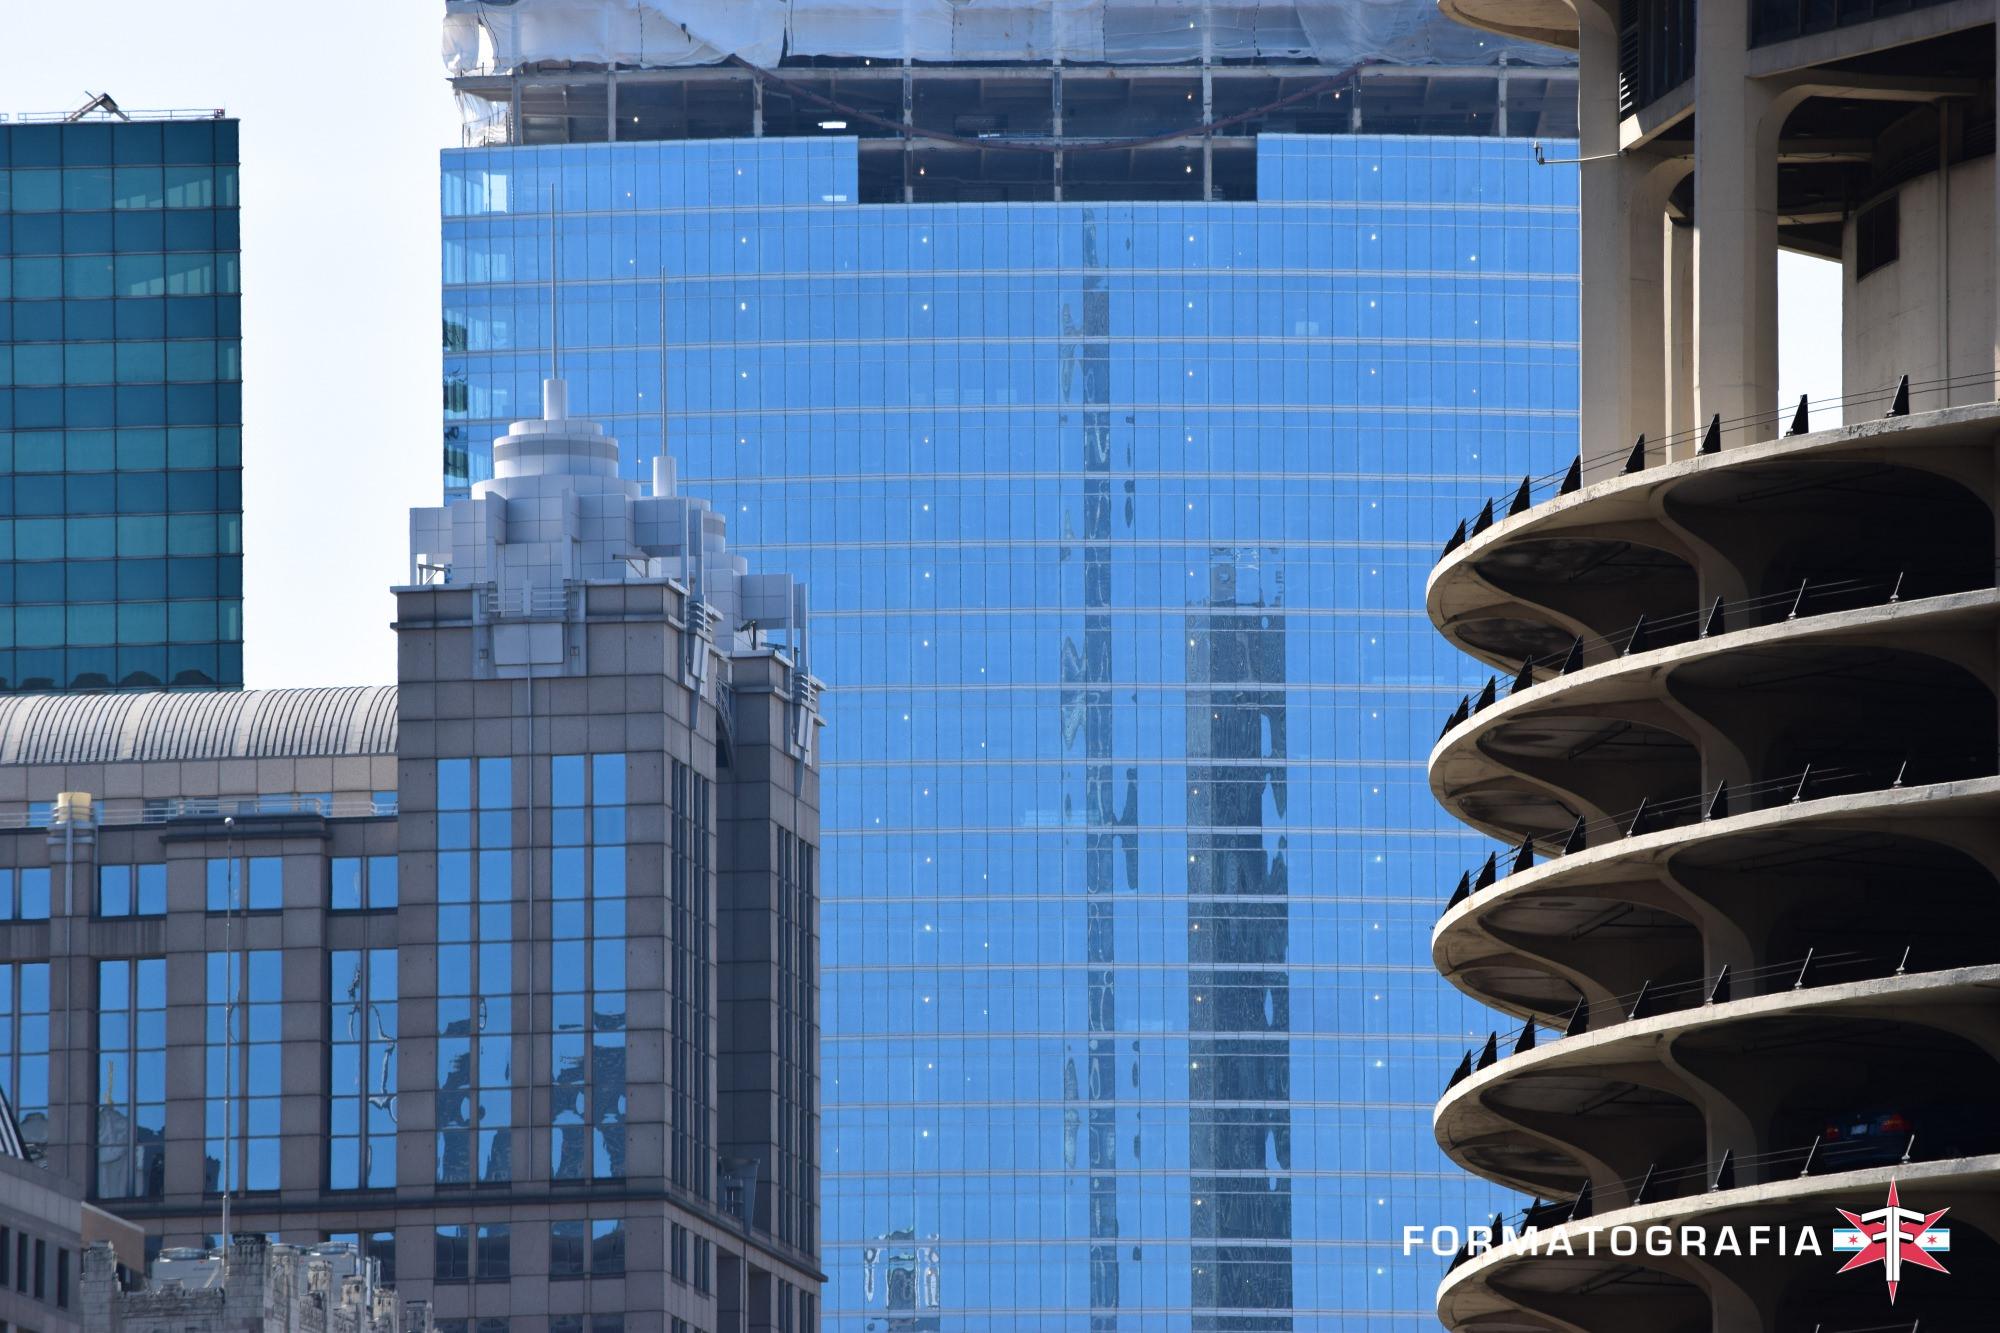 eric formato chicago photographer fall update city architecture shotsDSC_0611-2.jpg